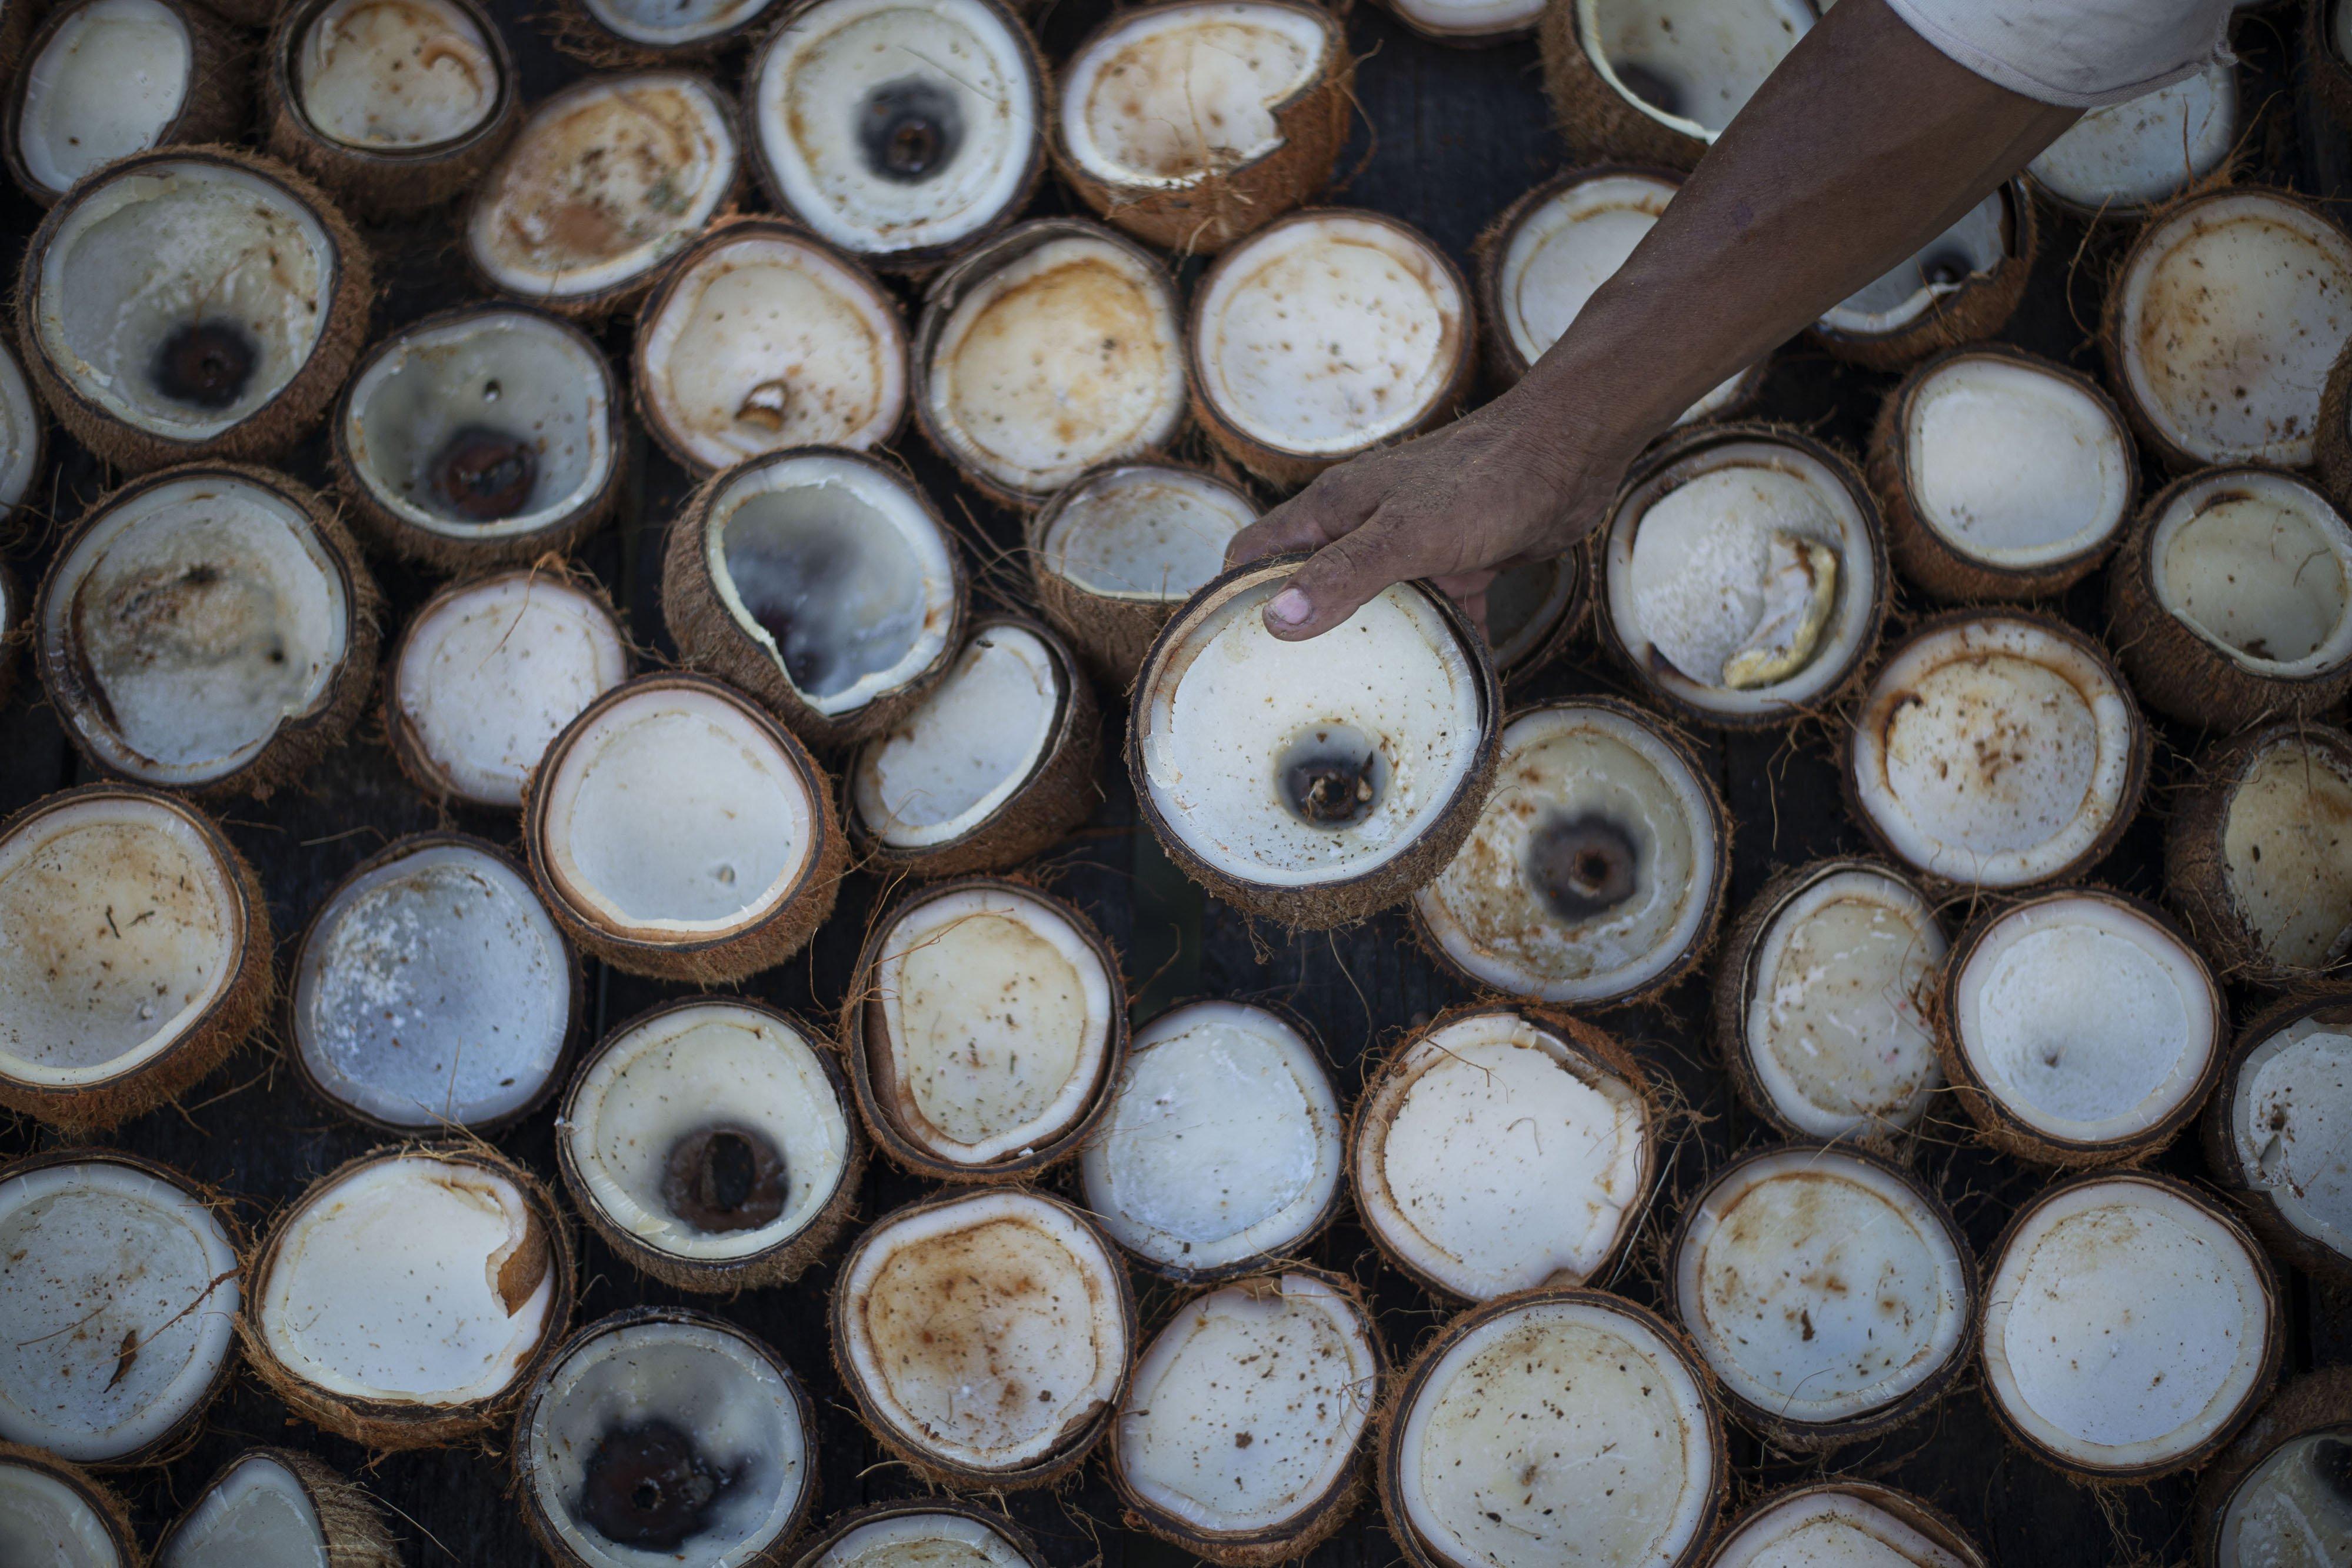 Warga mengolah kelapa menjadi kopra di Desa Air Payang, Pulau Laut, Kabupaten Natuna, Kepulauan Riau.